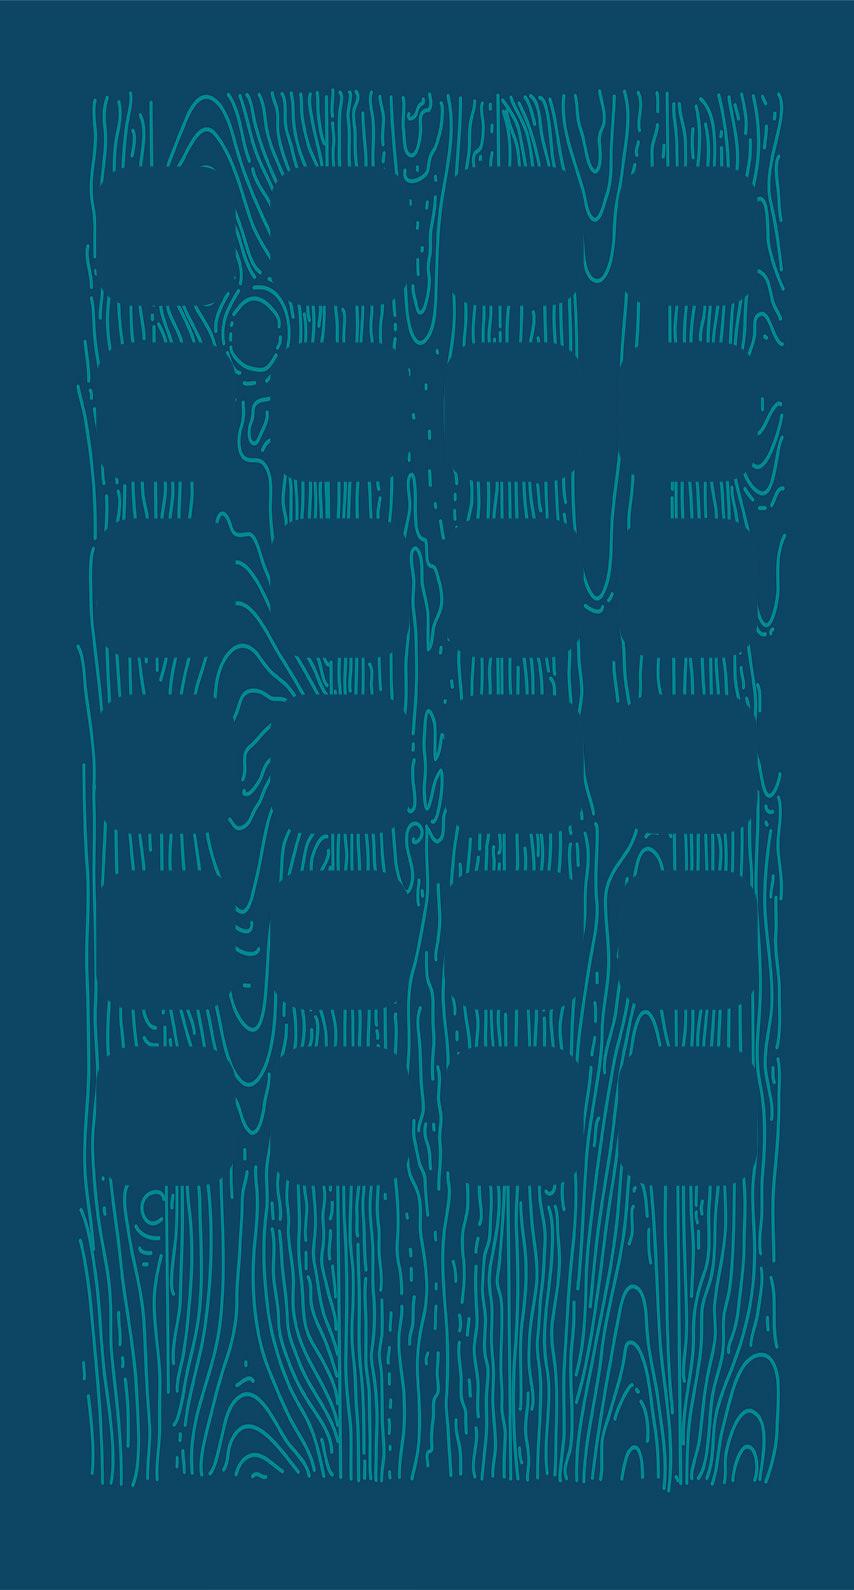 Illustrations Grain Blue Navy Shelf